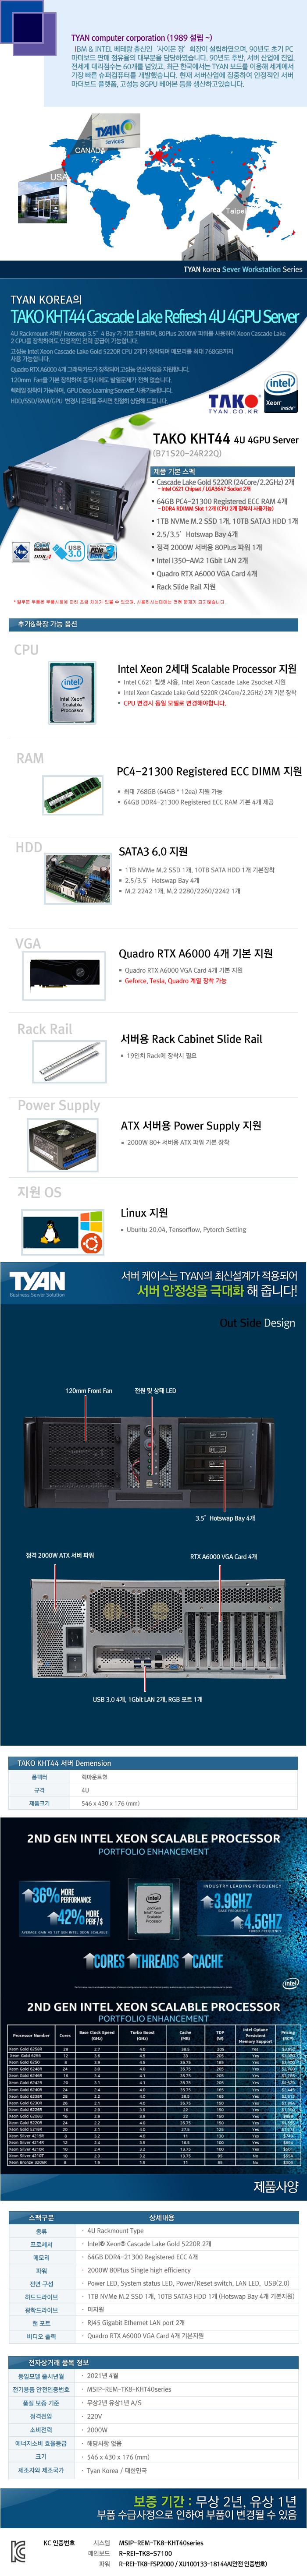 TYAN TAKO-KHT44-(B71S20-24R22Q)-RTX A6000 4GPU (256GB, M2 1TB + 6TB)